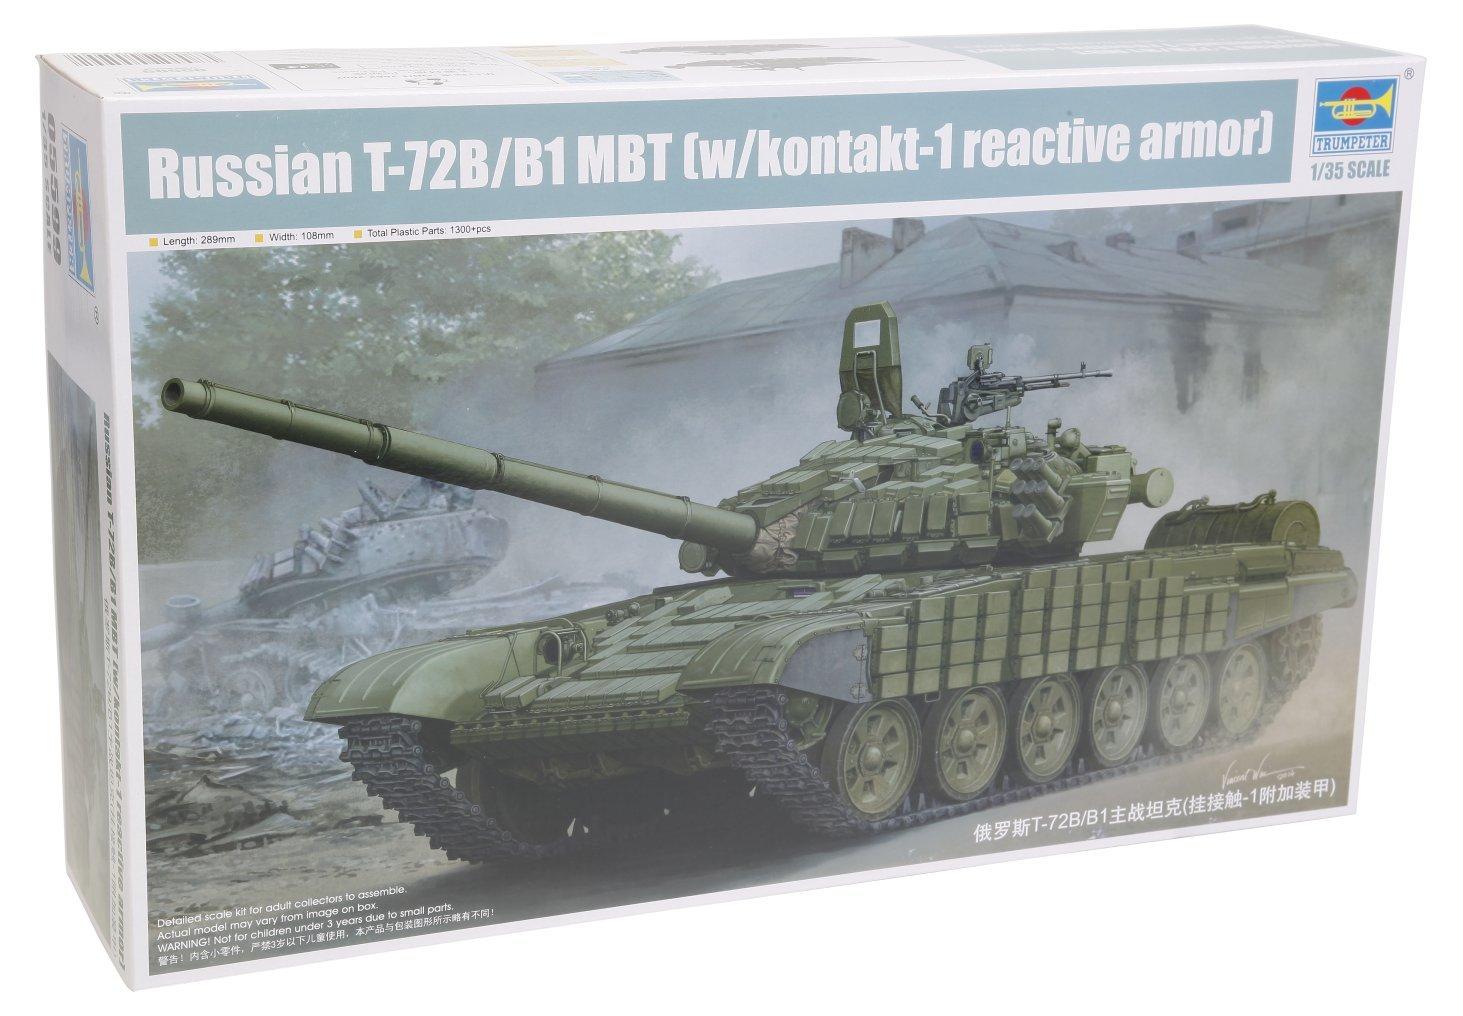 Trumpeter Russian T-72B/B1 MBT with Kontakt-1 Model Kit (1:35 Scale)